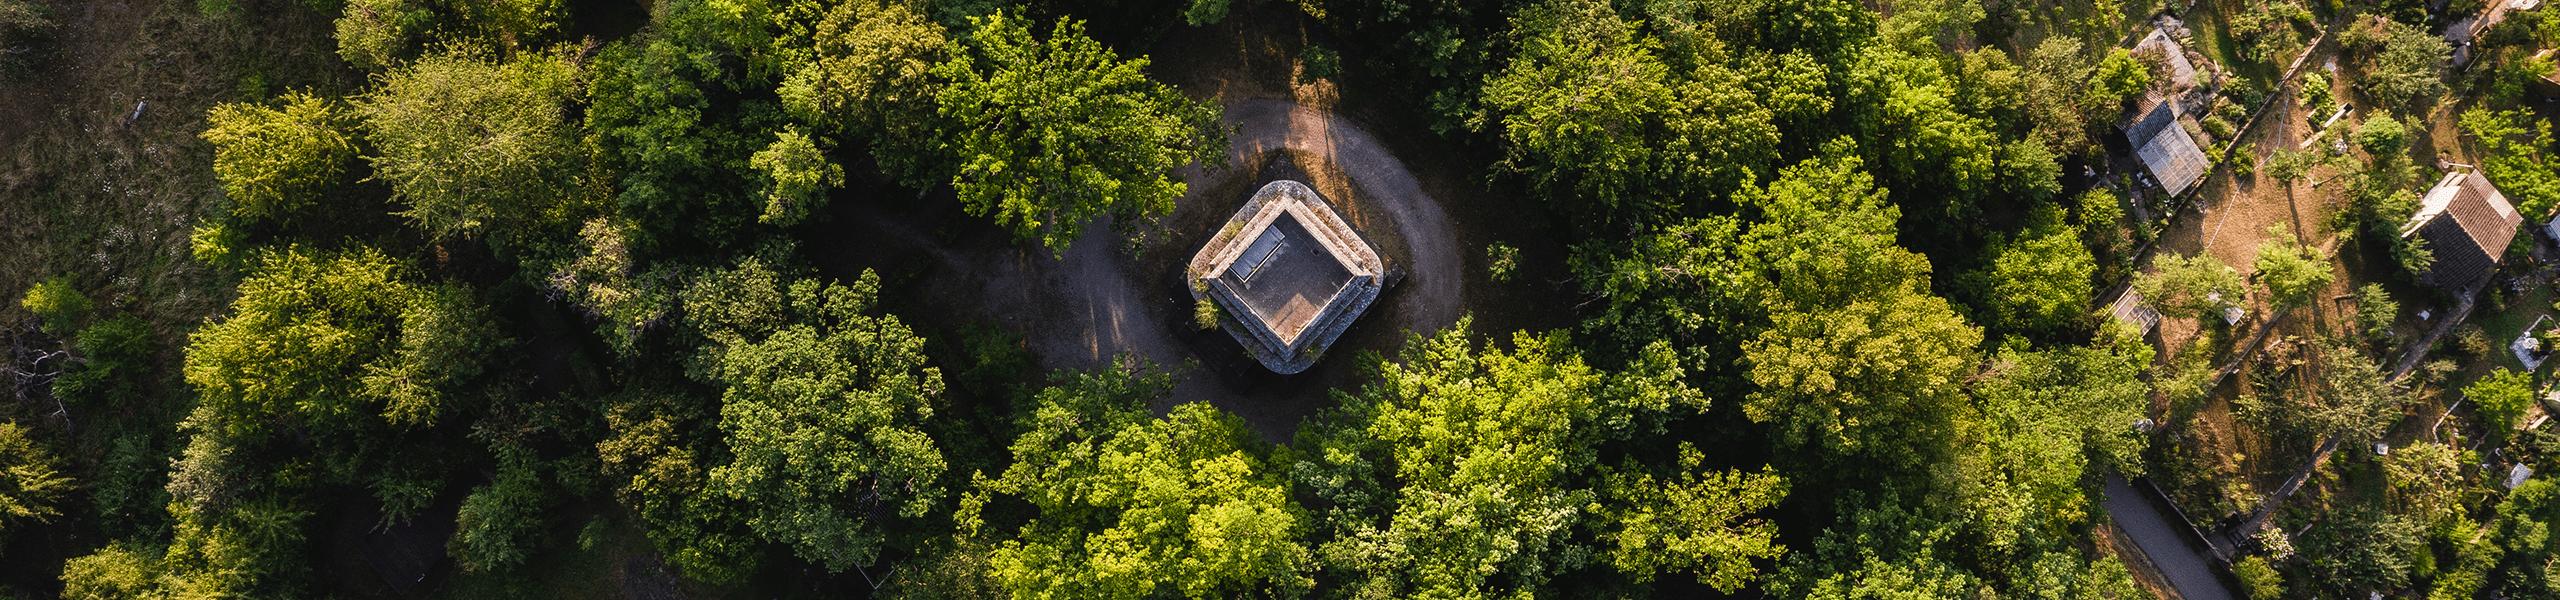 Luftaufnahme des Tübinger Bismarckturms